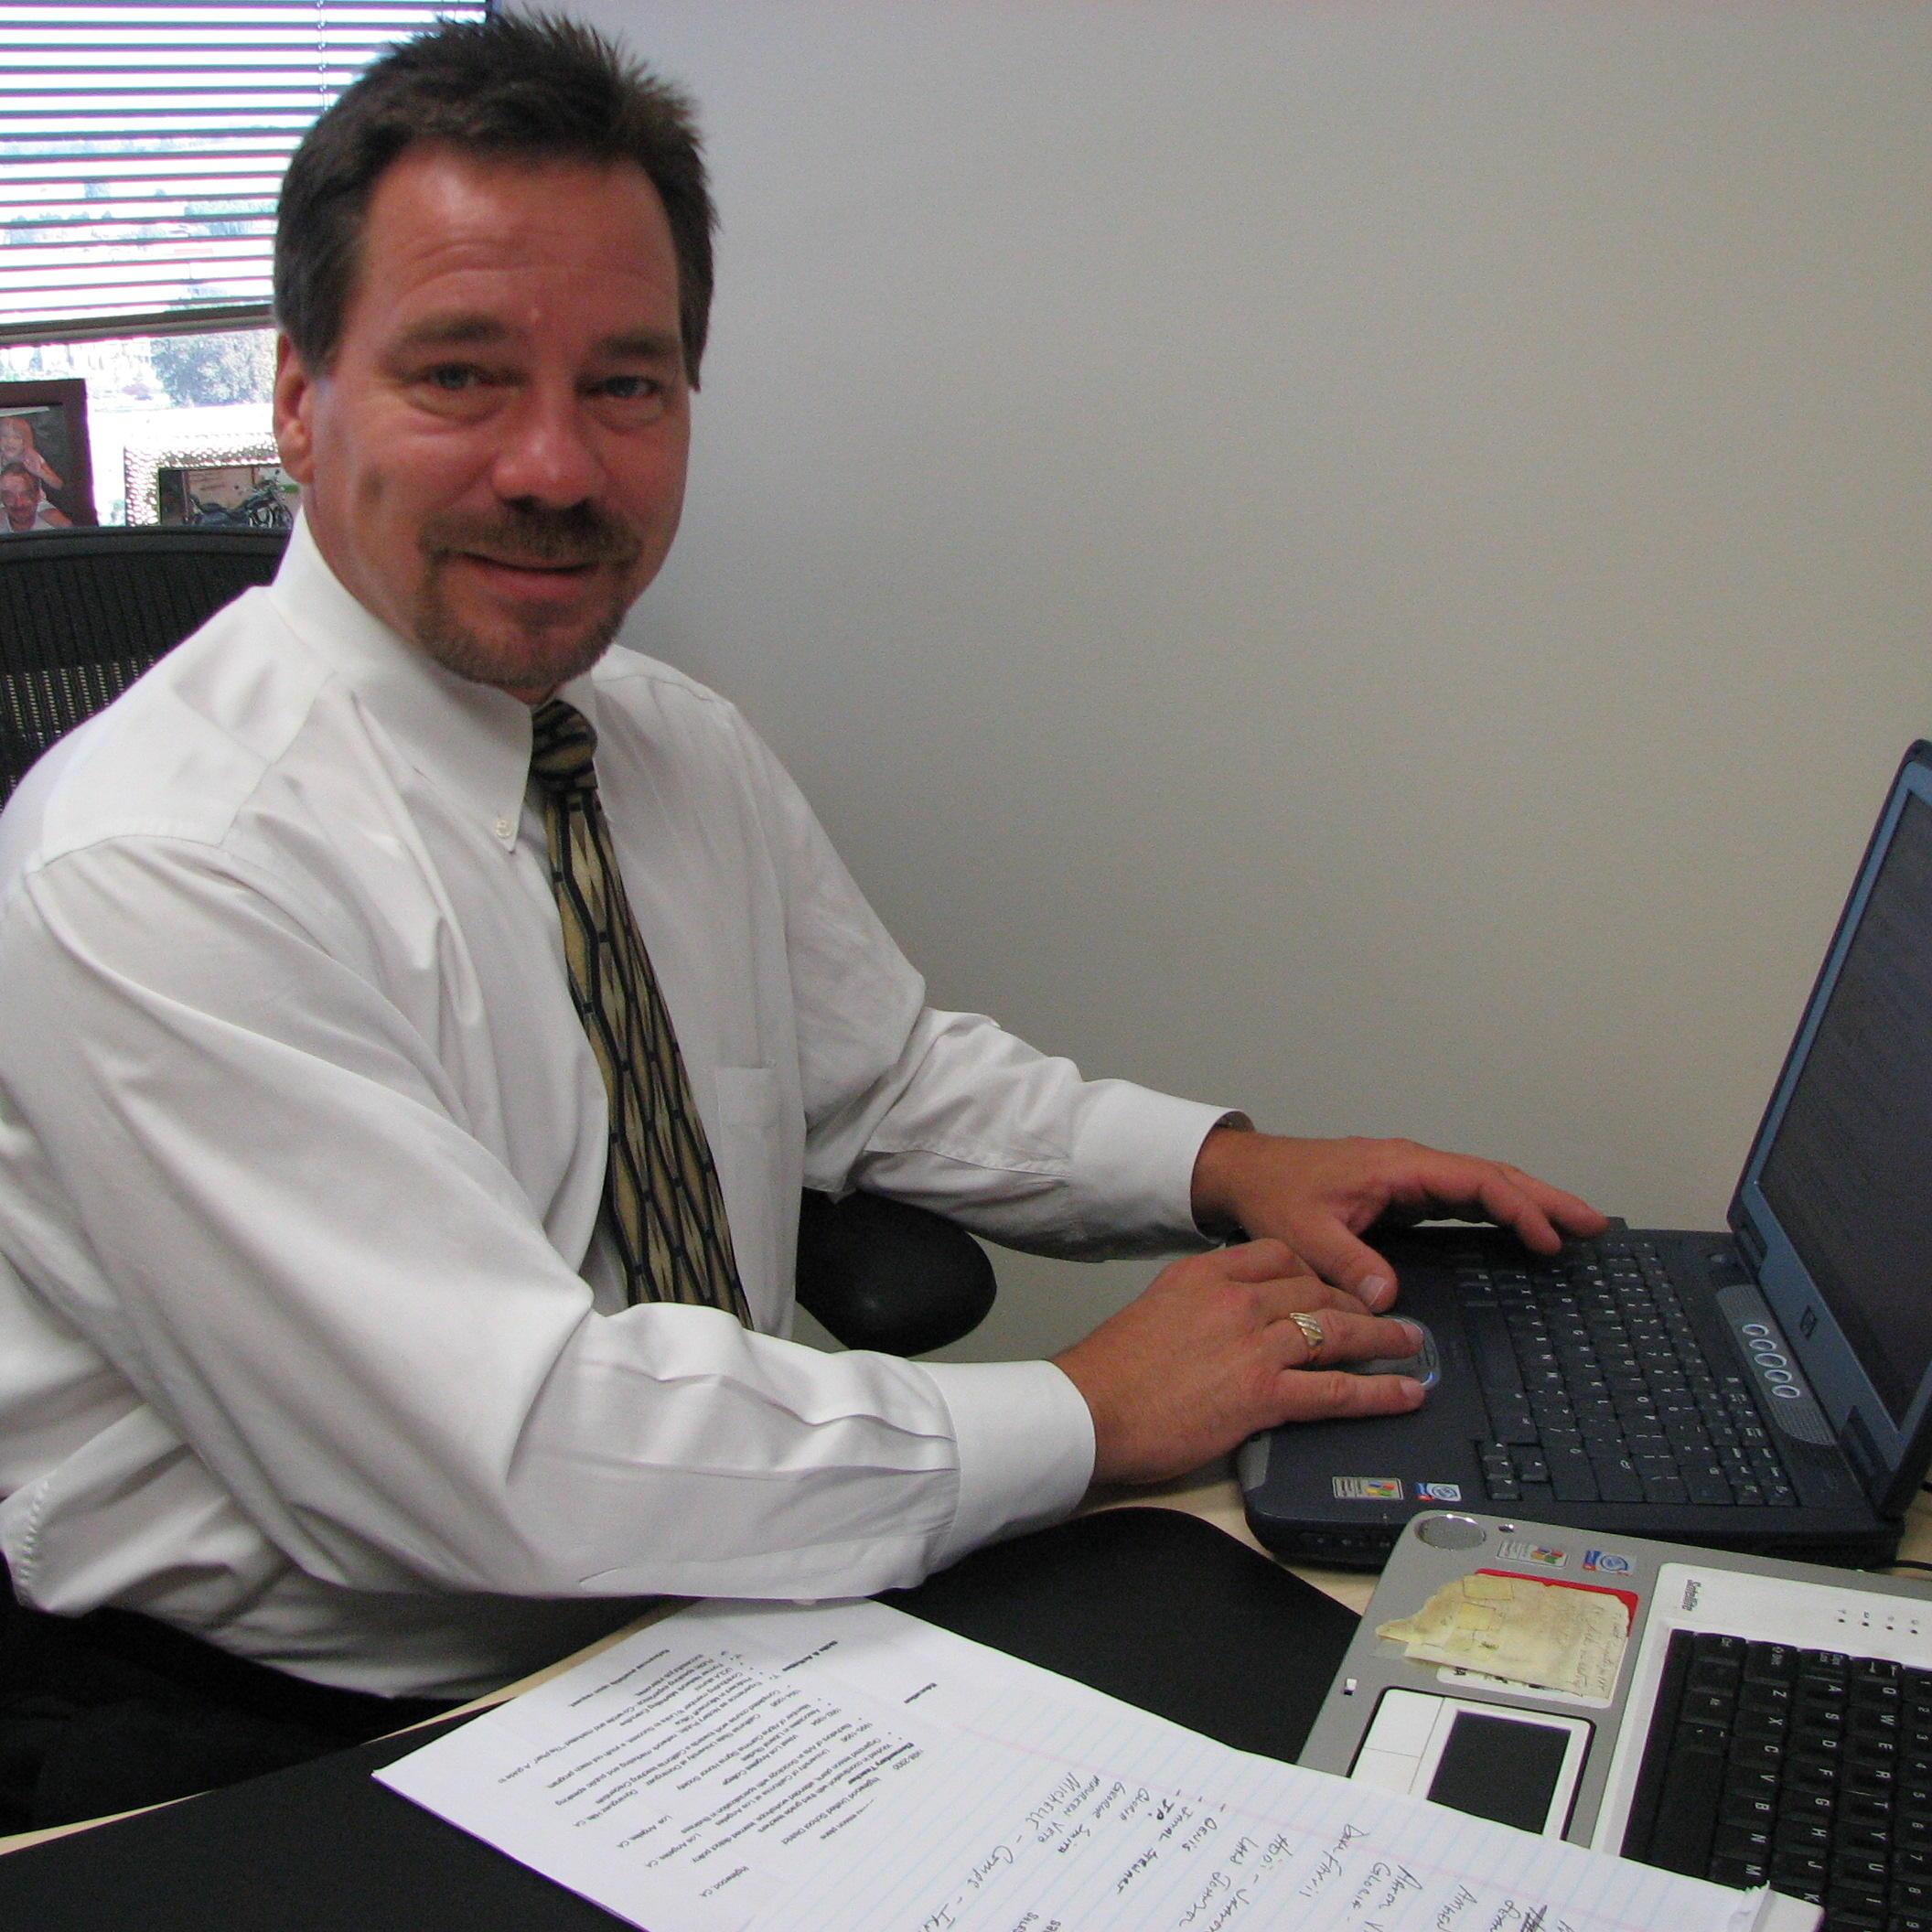 Brad Naylor